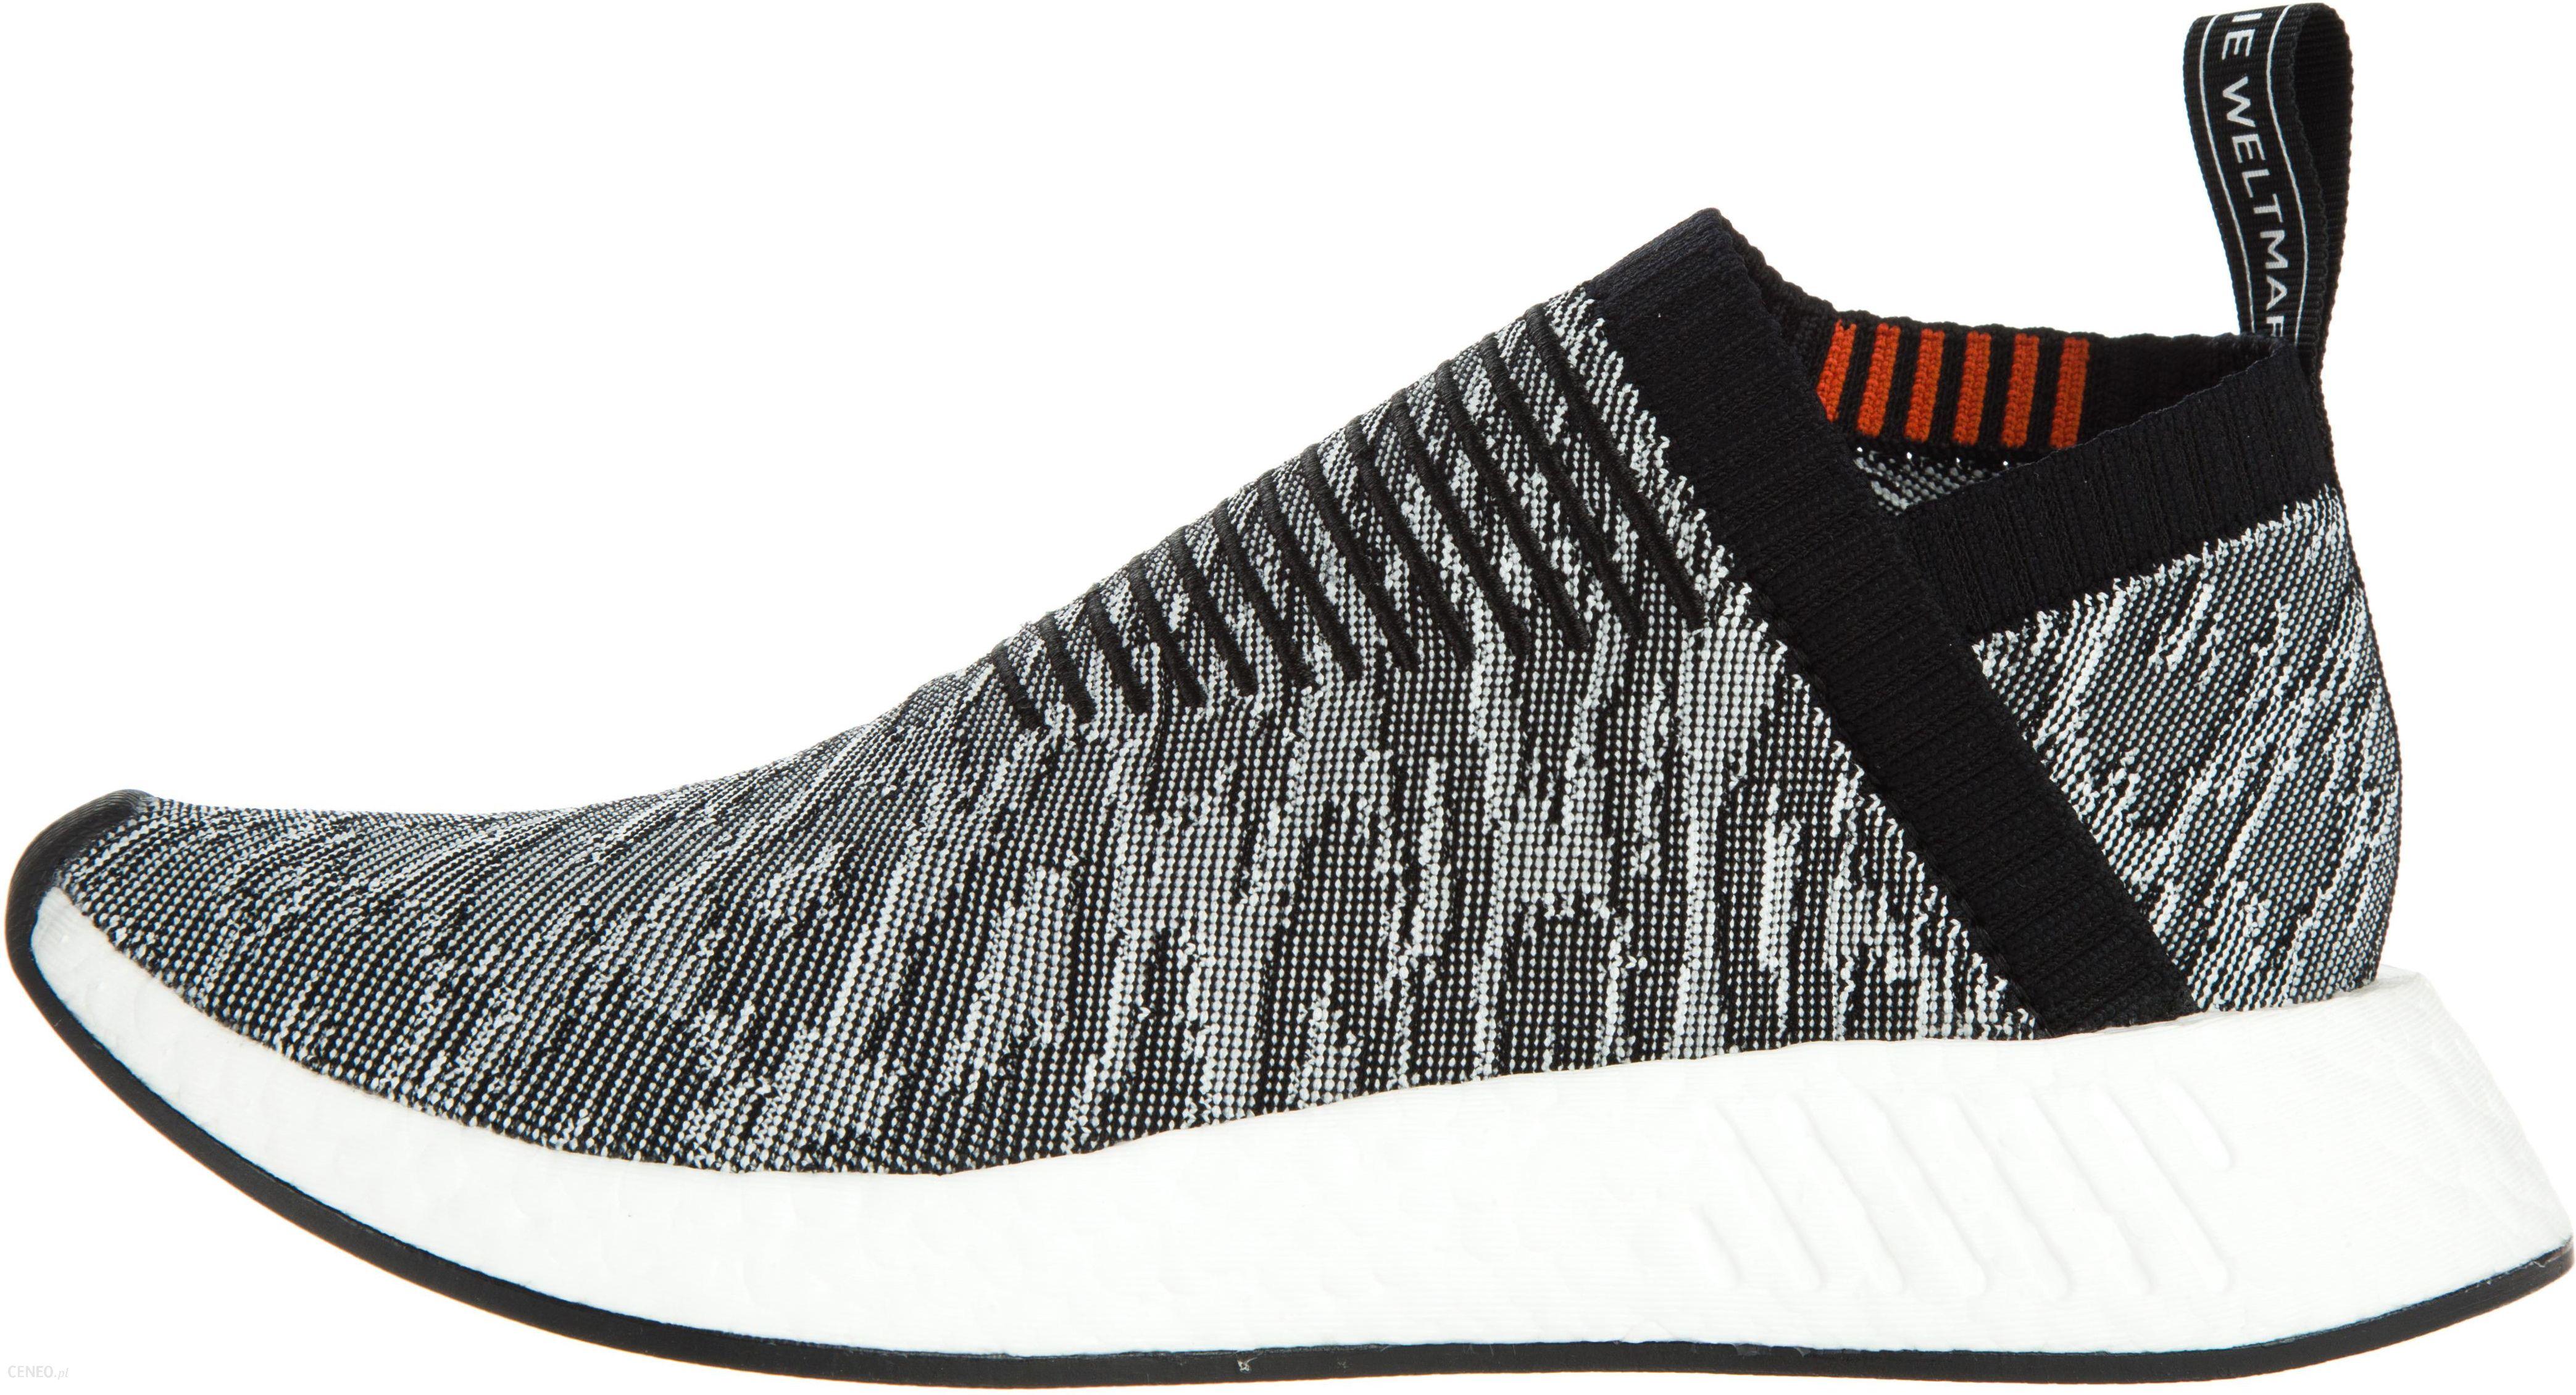 free shipping b8091 5df68 adidas Originals NMD CS2 Primeknit Tenisówki Czarny 42 - zdjęcie 1